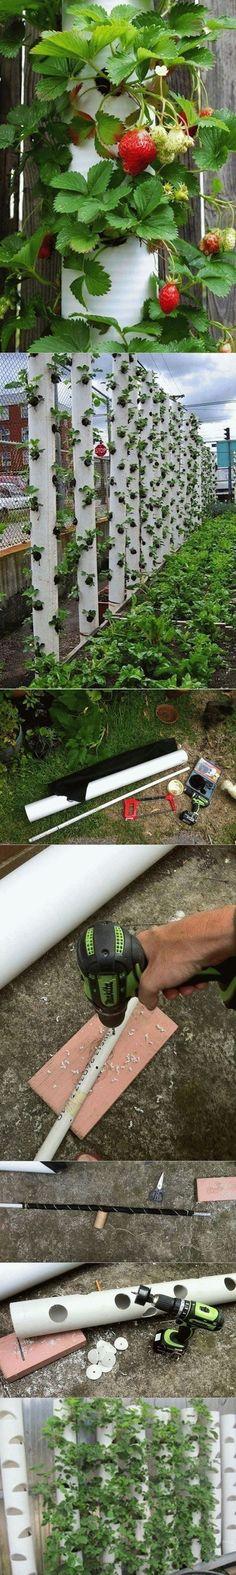 DIY vertical strawberry garden using PVC pipe #hydroponicgardening